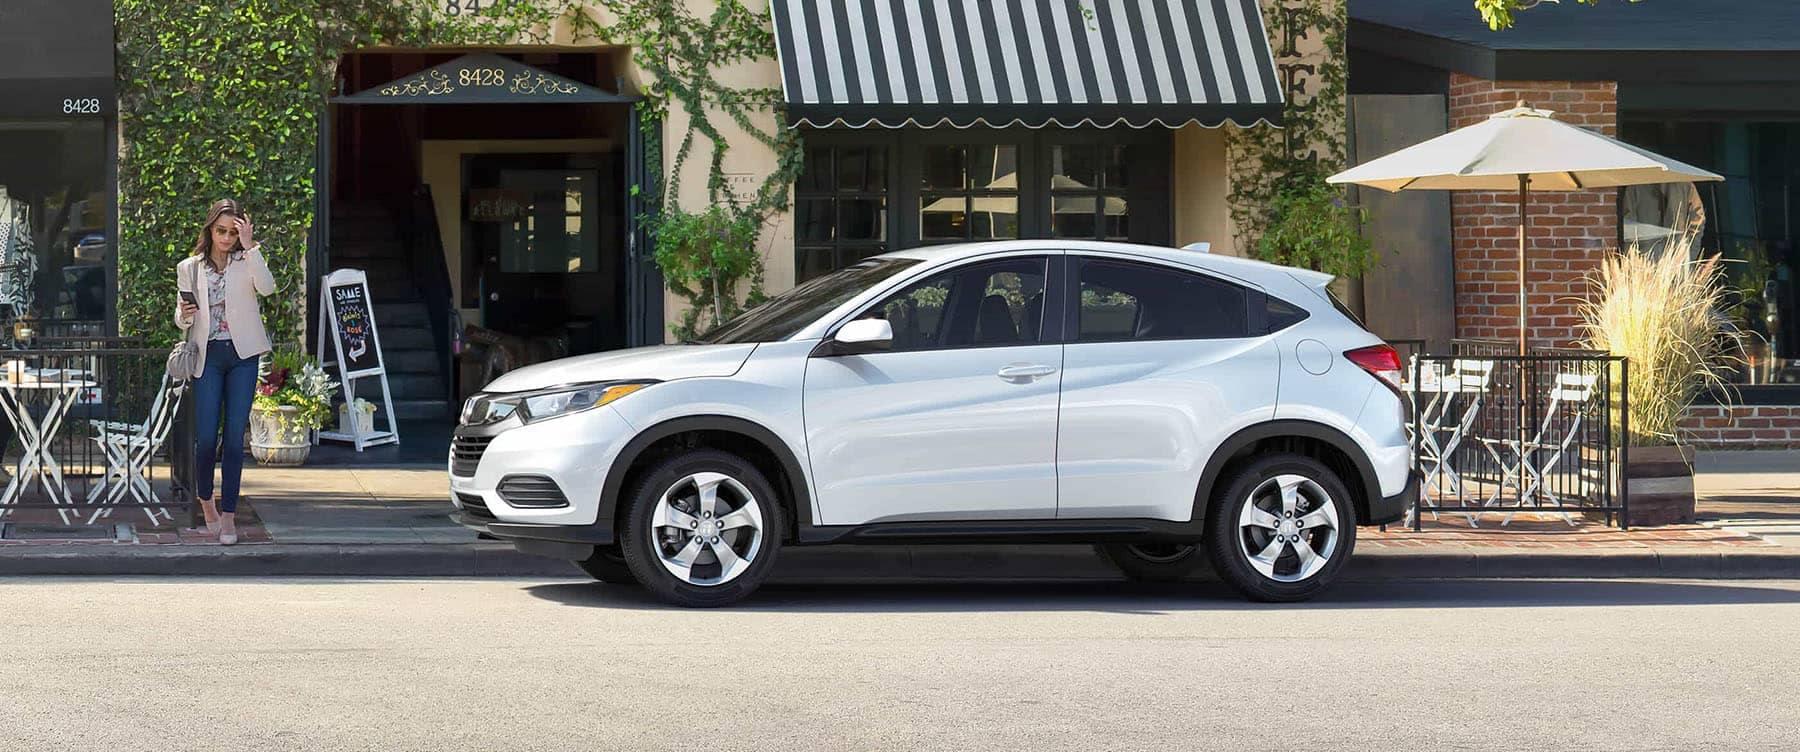 2019 Honda HR-V LX Parked on Side of Street